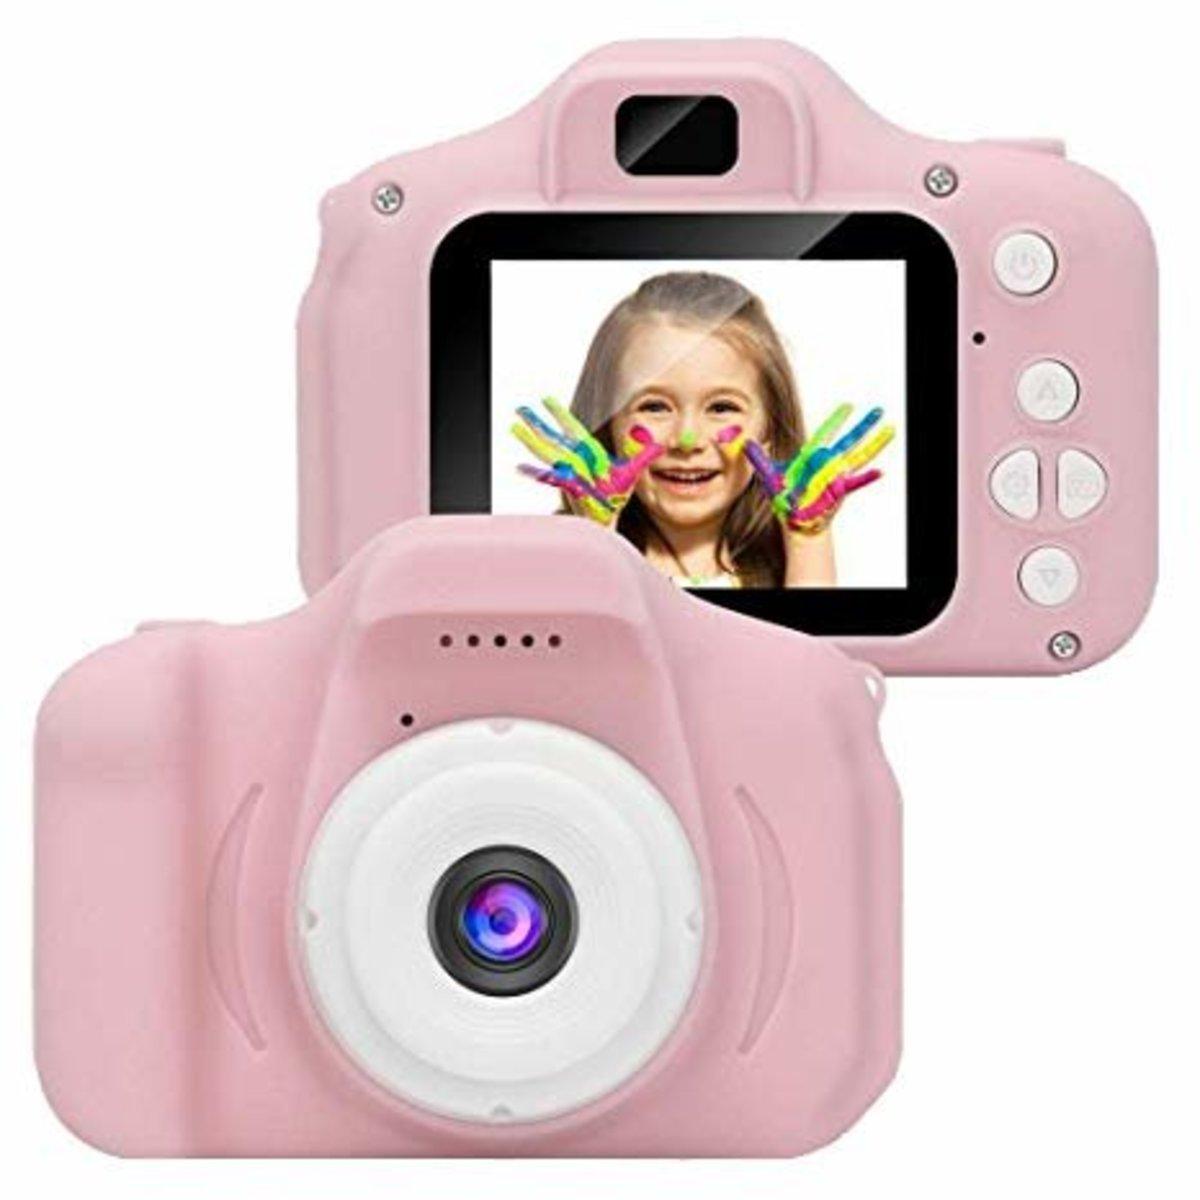 X2 兒童數碼相機 (粉紅色) - 兒童,教材,玩具,禮物